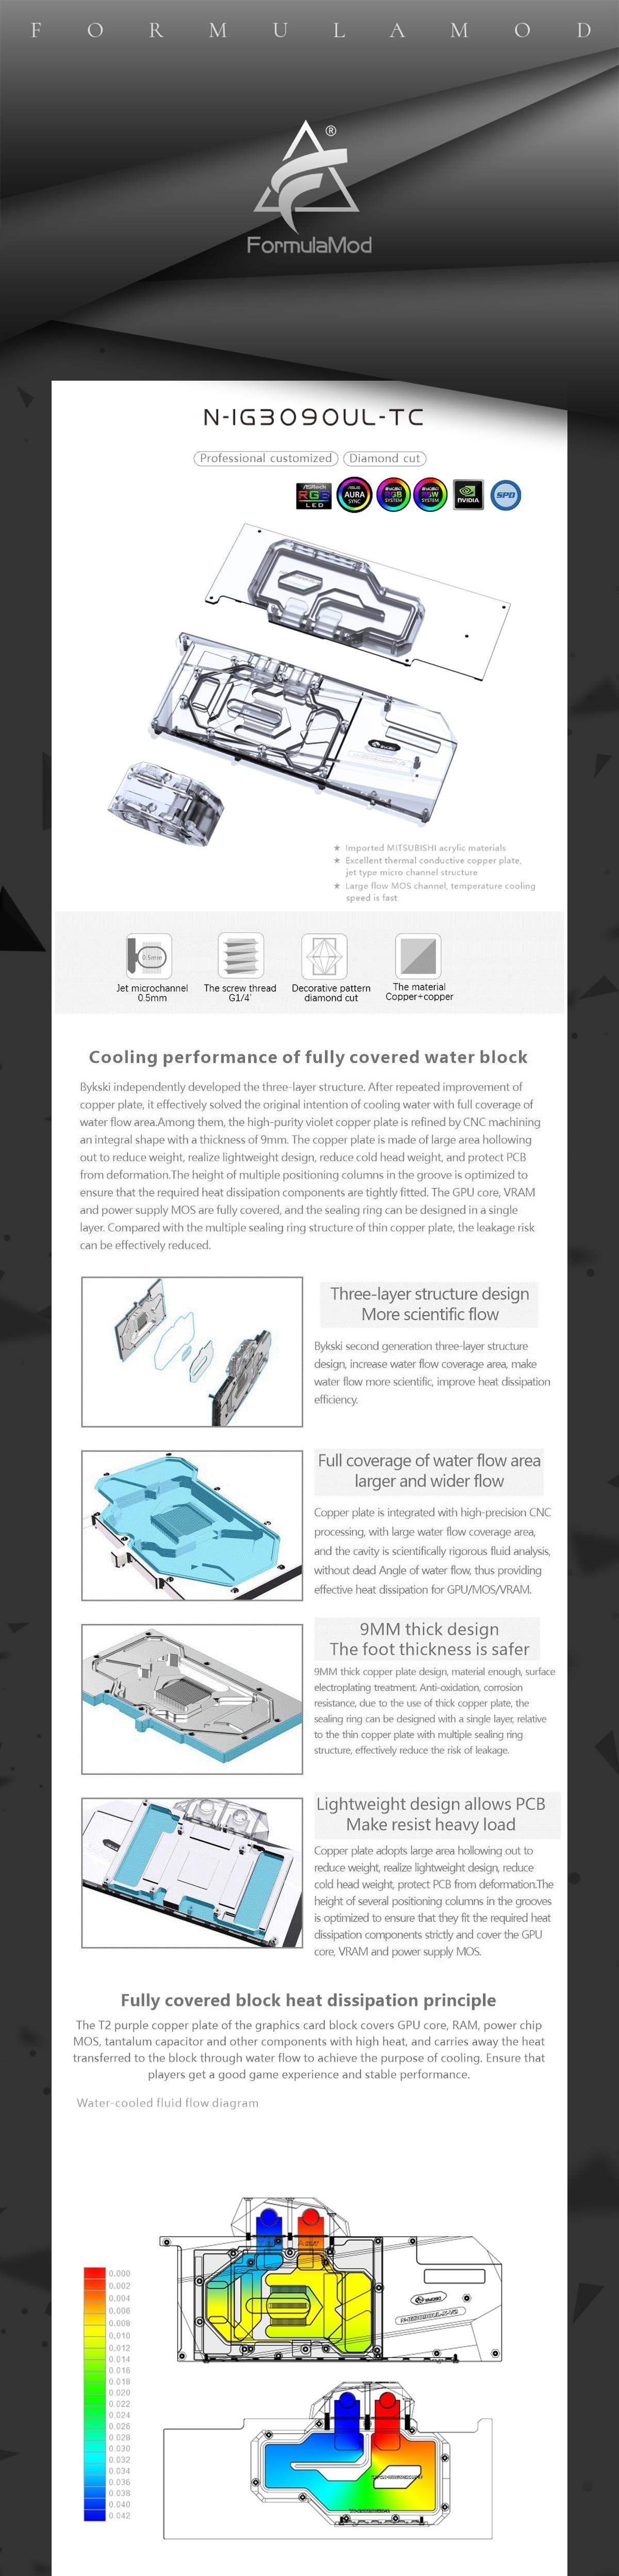 Bykski GPU Block With Active Waterway Backplane Cooler For Colorful iGame RTX 3090 3080 Advanced / Ultra N-IG3090UL-TC